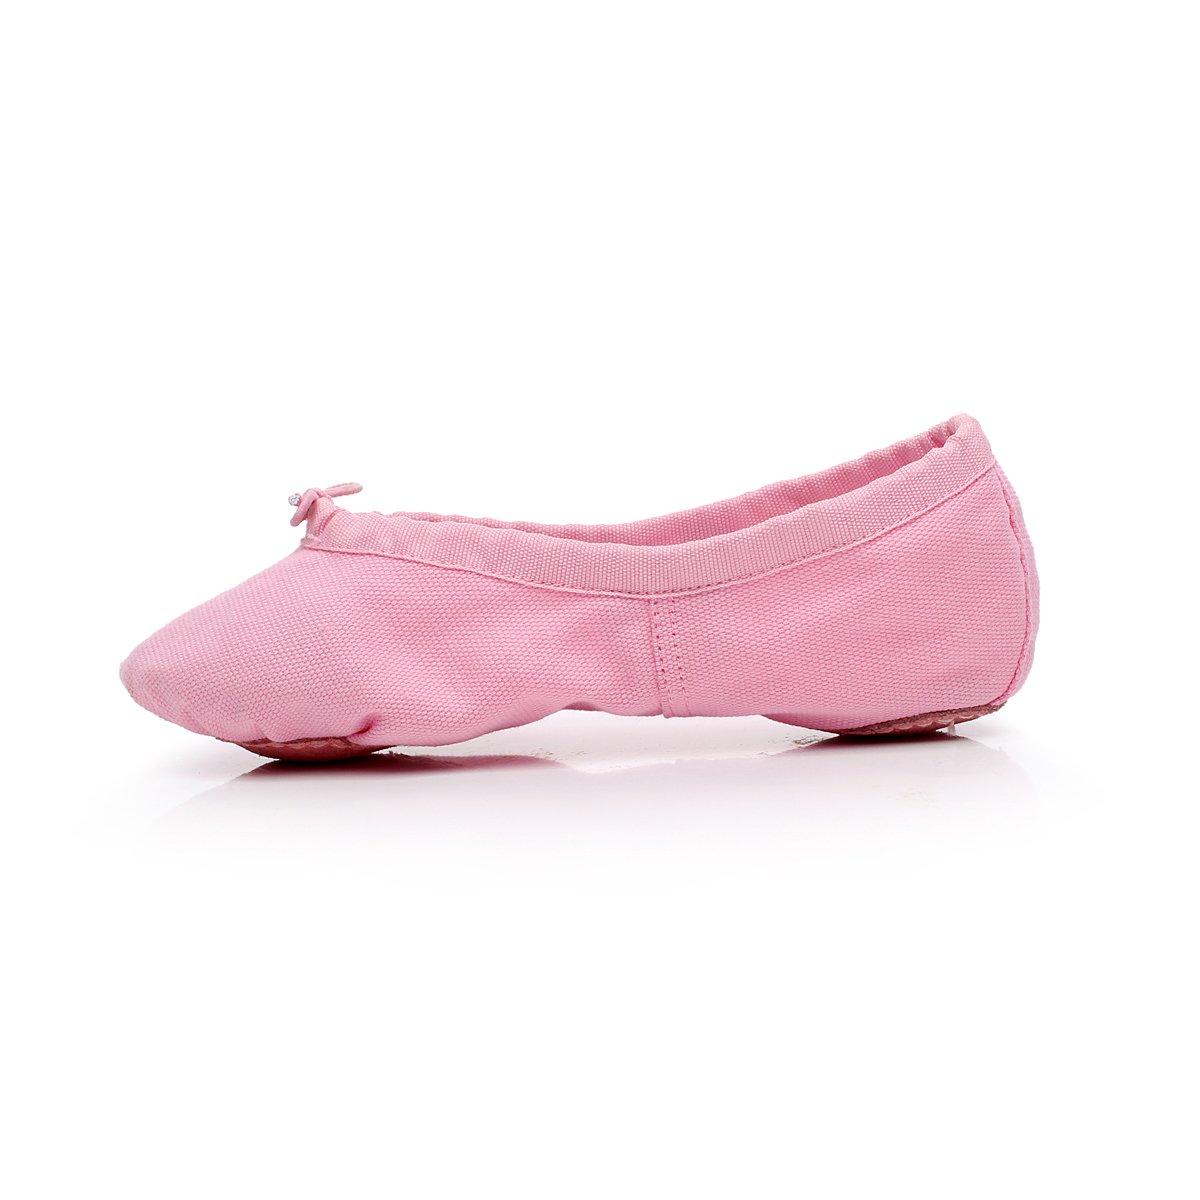 Women's Canvas Ballet Slipper Split Sole Gymnastics Yoga Shoe (US10, Pink)